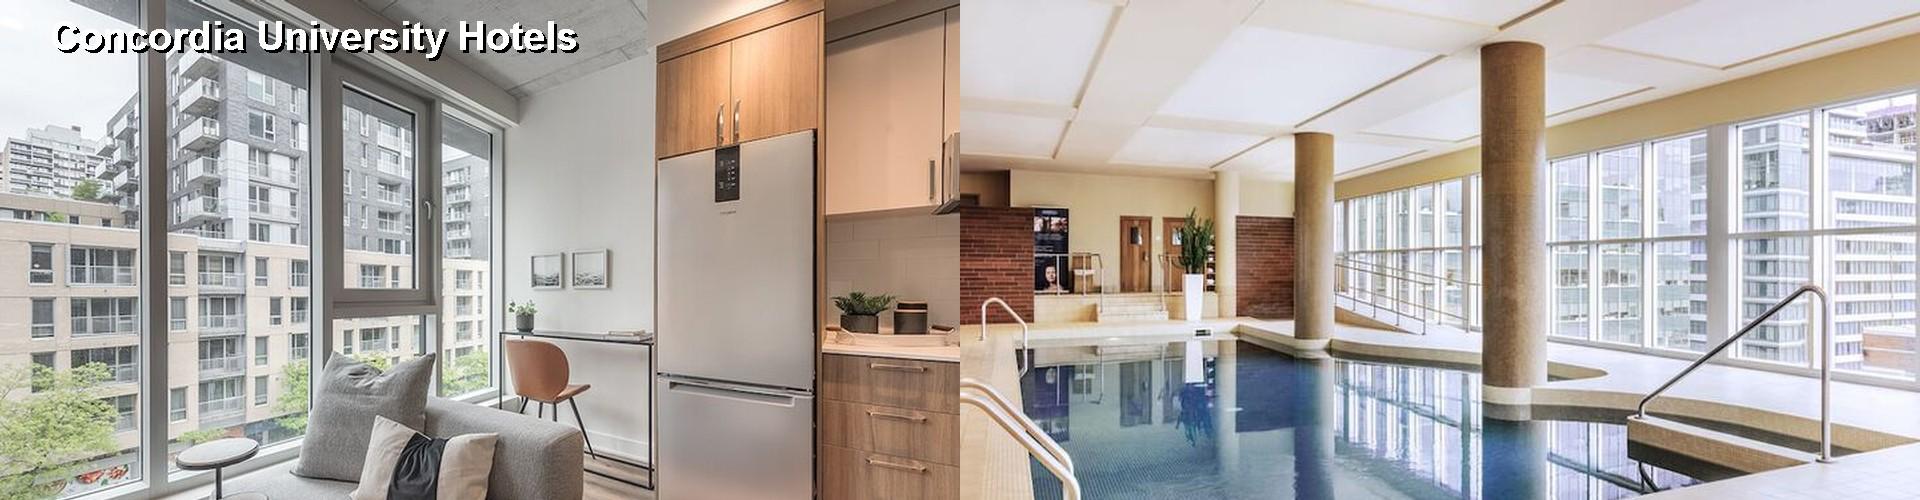 Hotels Near Concordia University Montreal